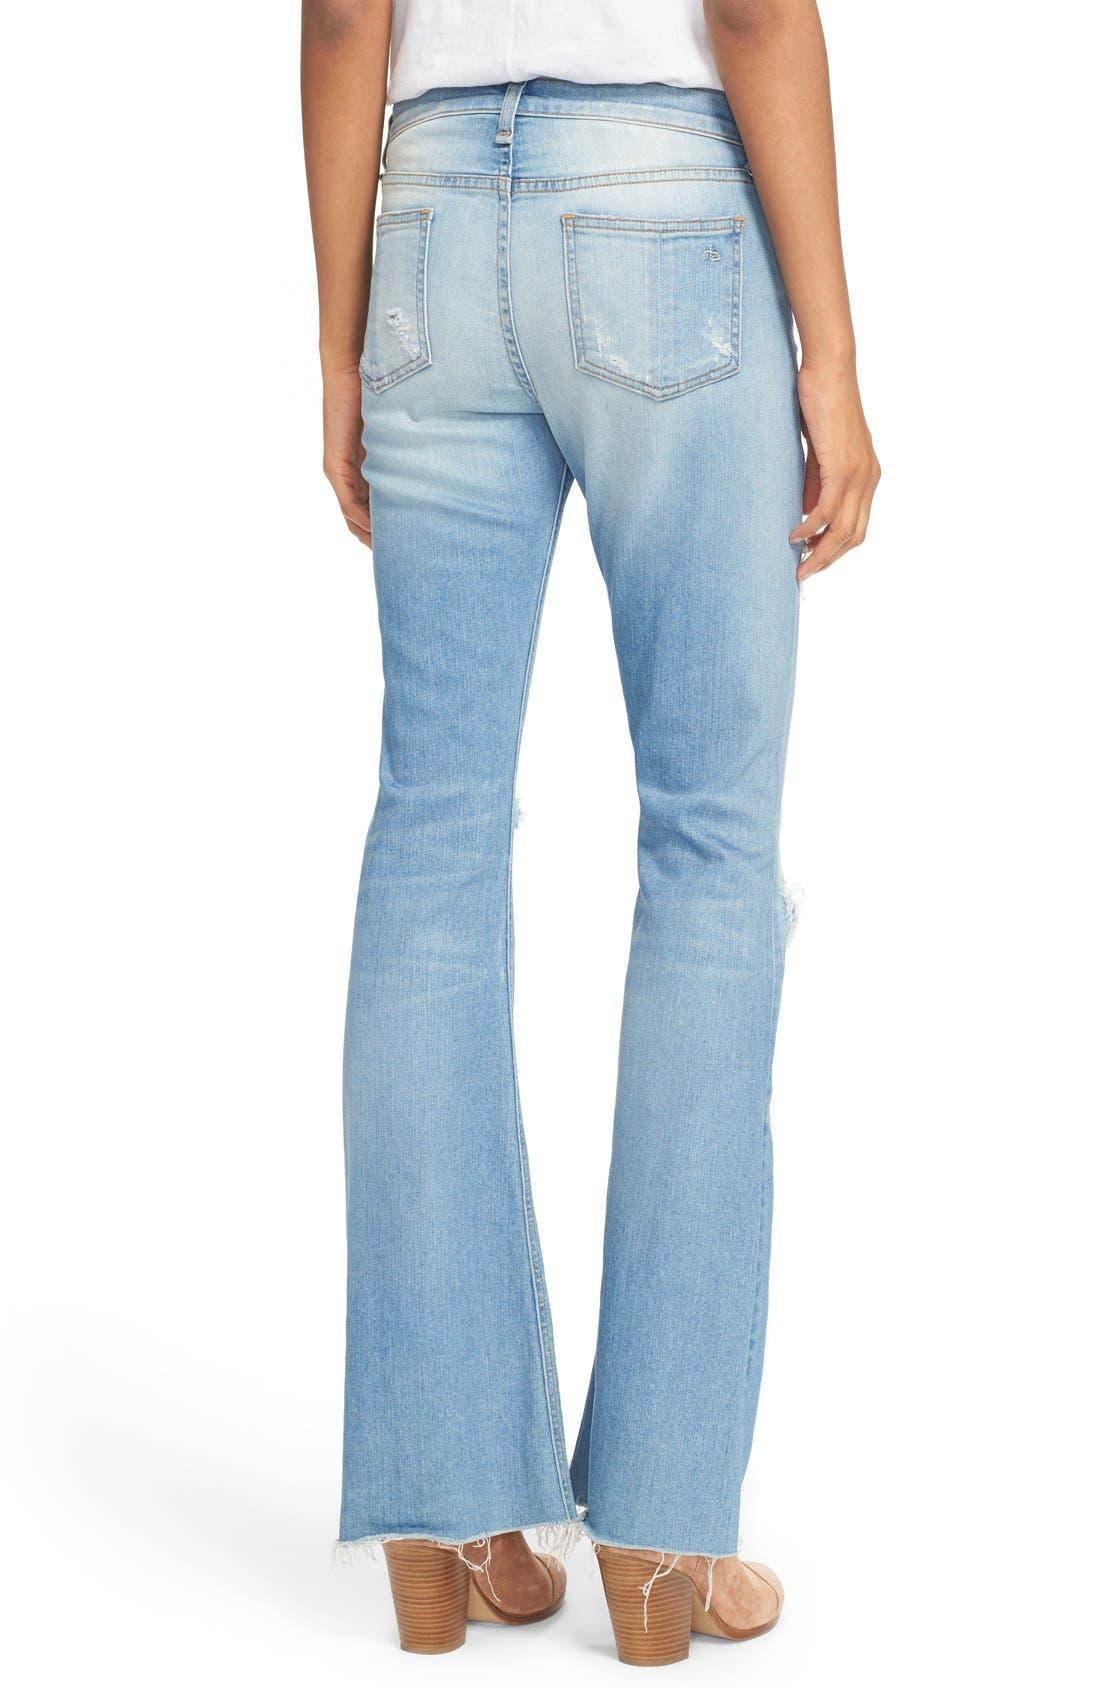 Alternate Image 2  - rag & bone/JEAN 'Beach' High Rise Bell Bottom Jeans (Ryder)